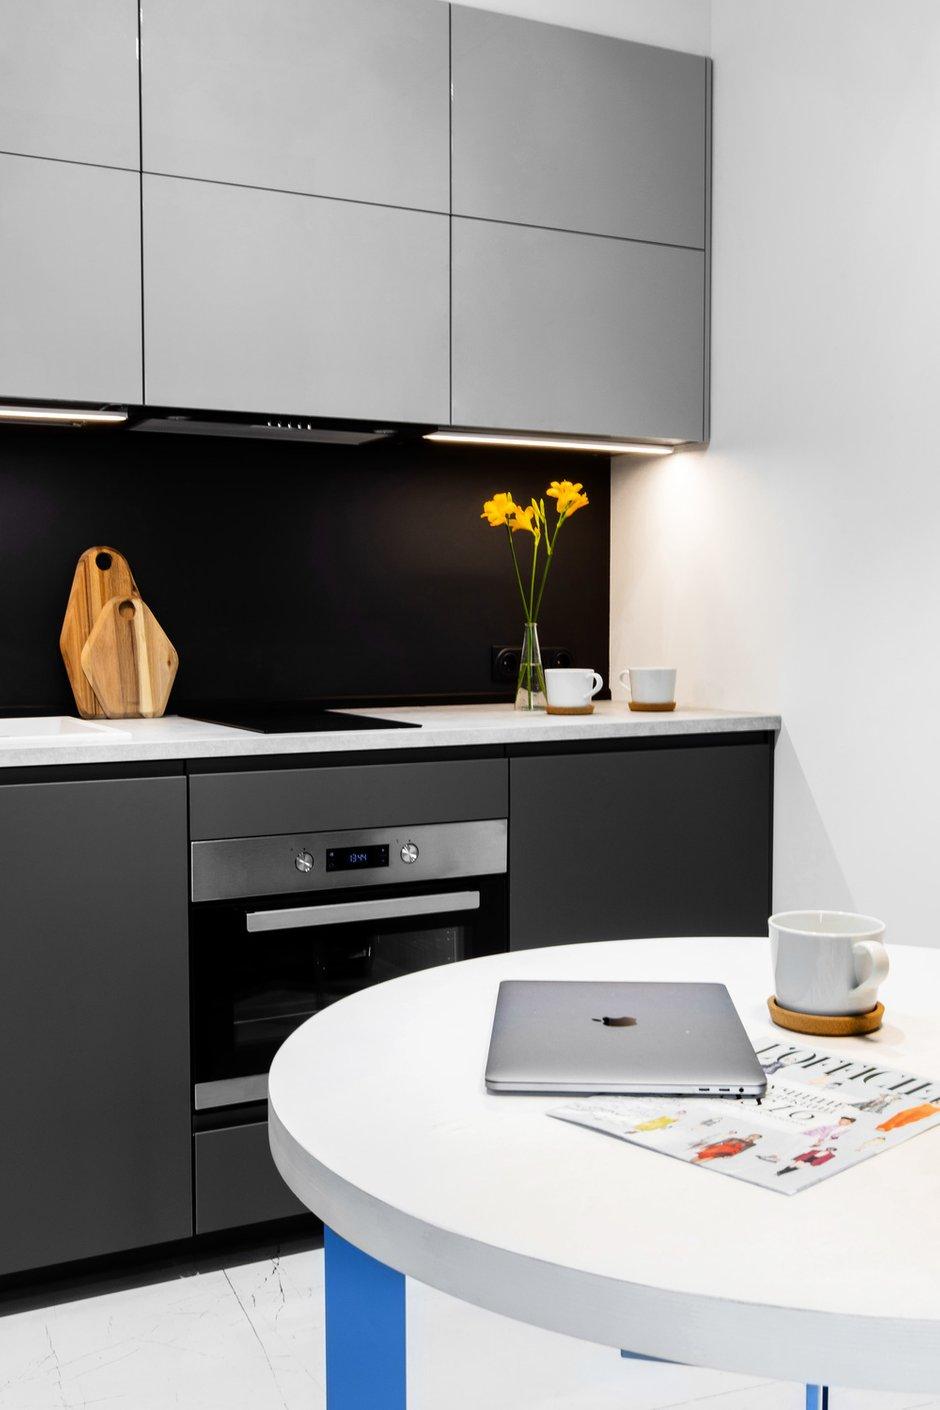 Фотография: Кухня и столовая в стиле Минимализм, Квартира, Студия, Проект недели, Москва, до 40 метров, Давид Аксенов – фото на INMYROOM